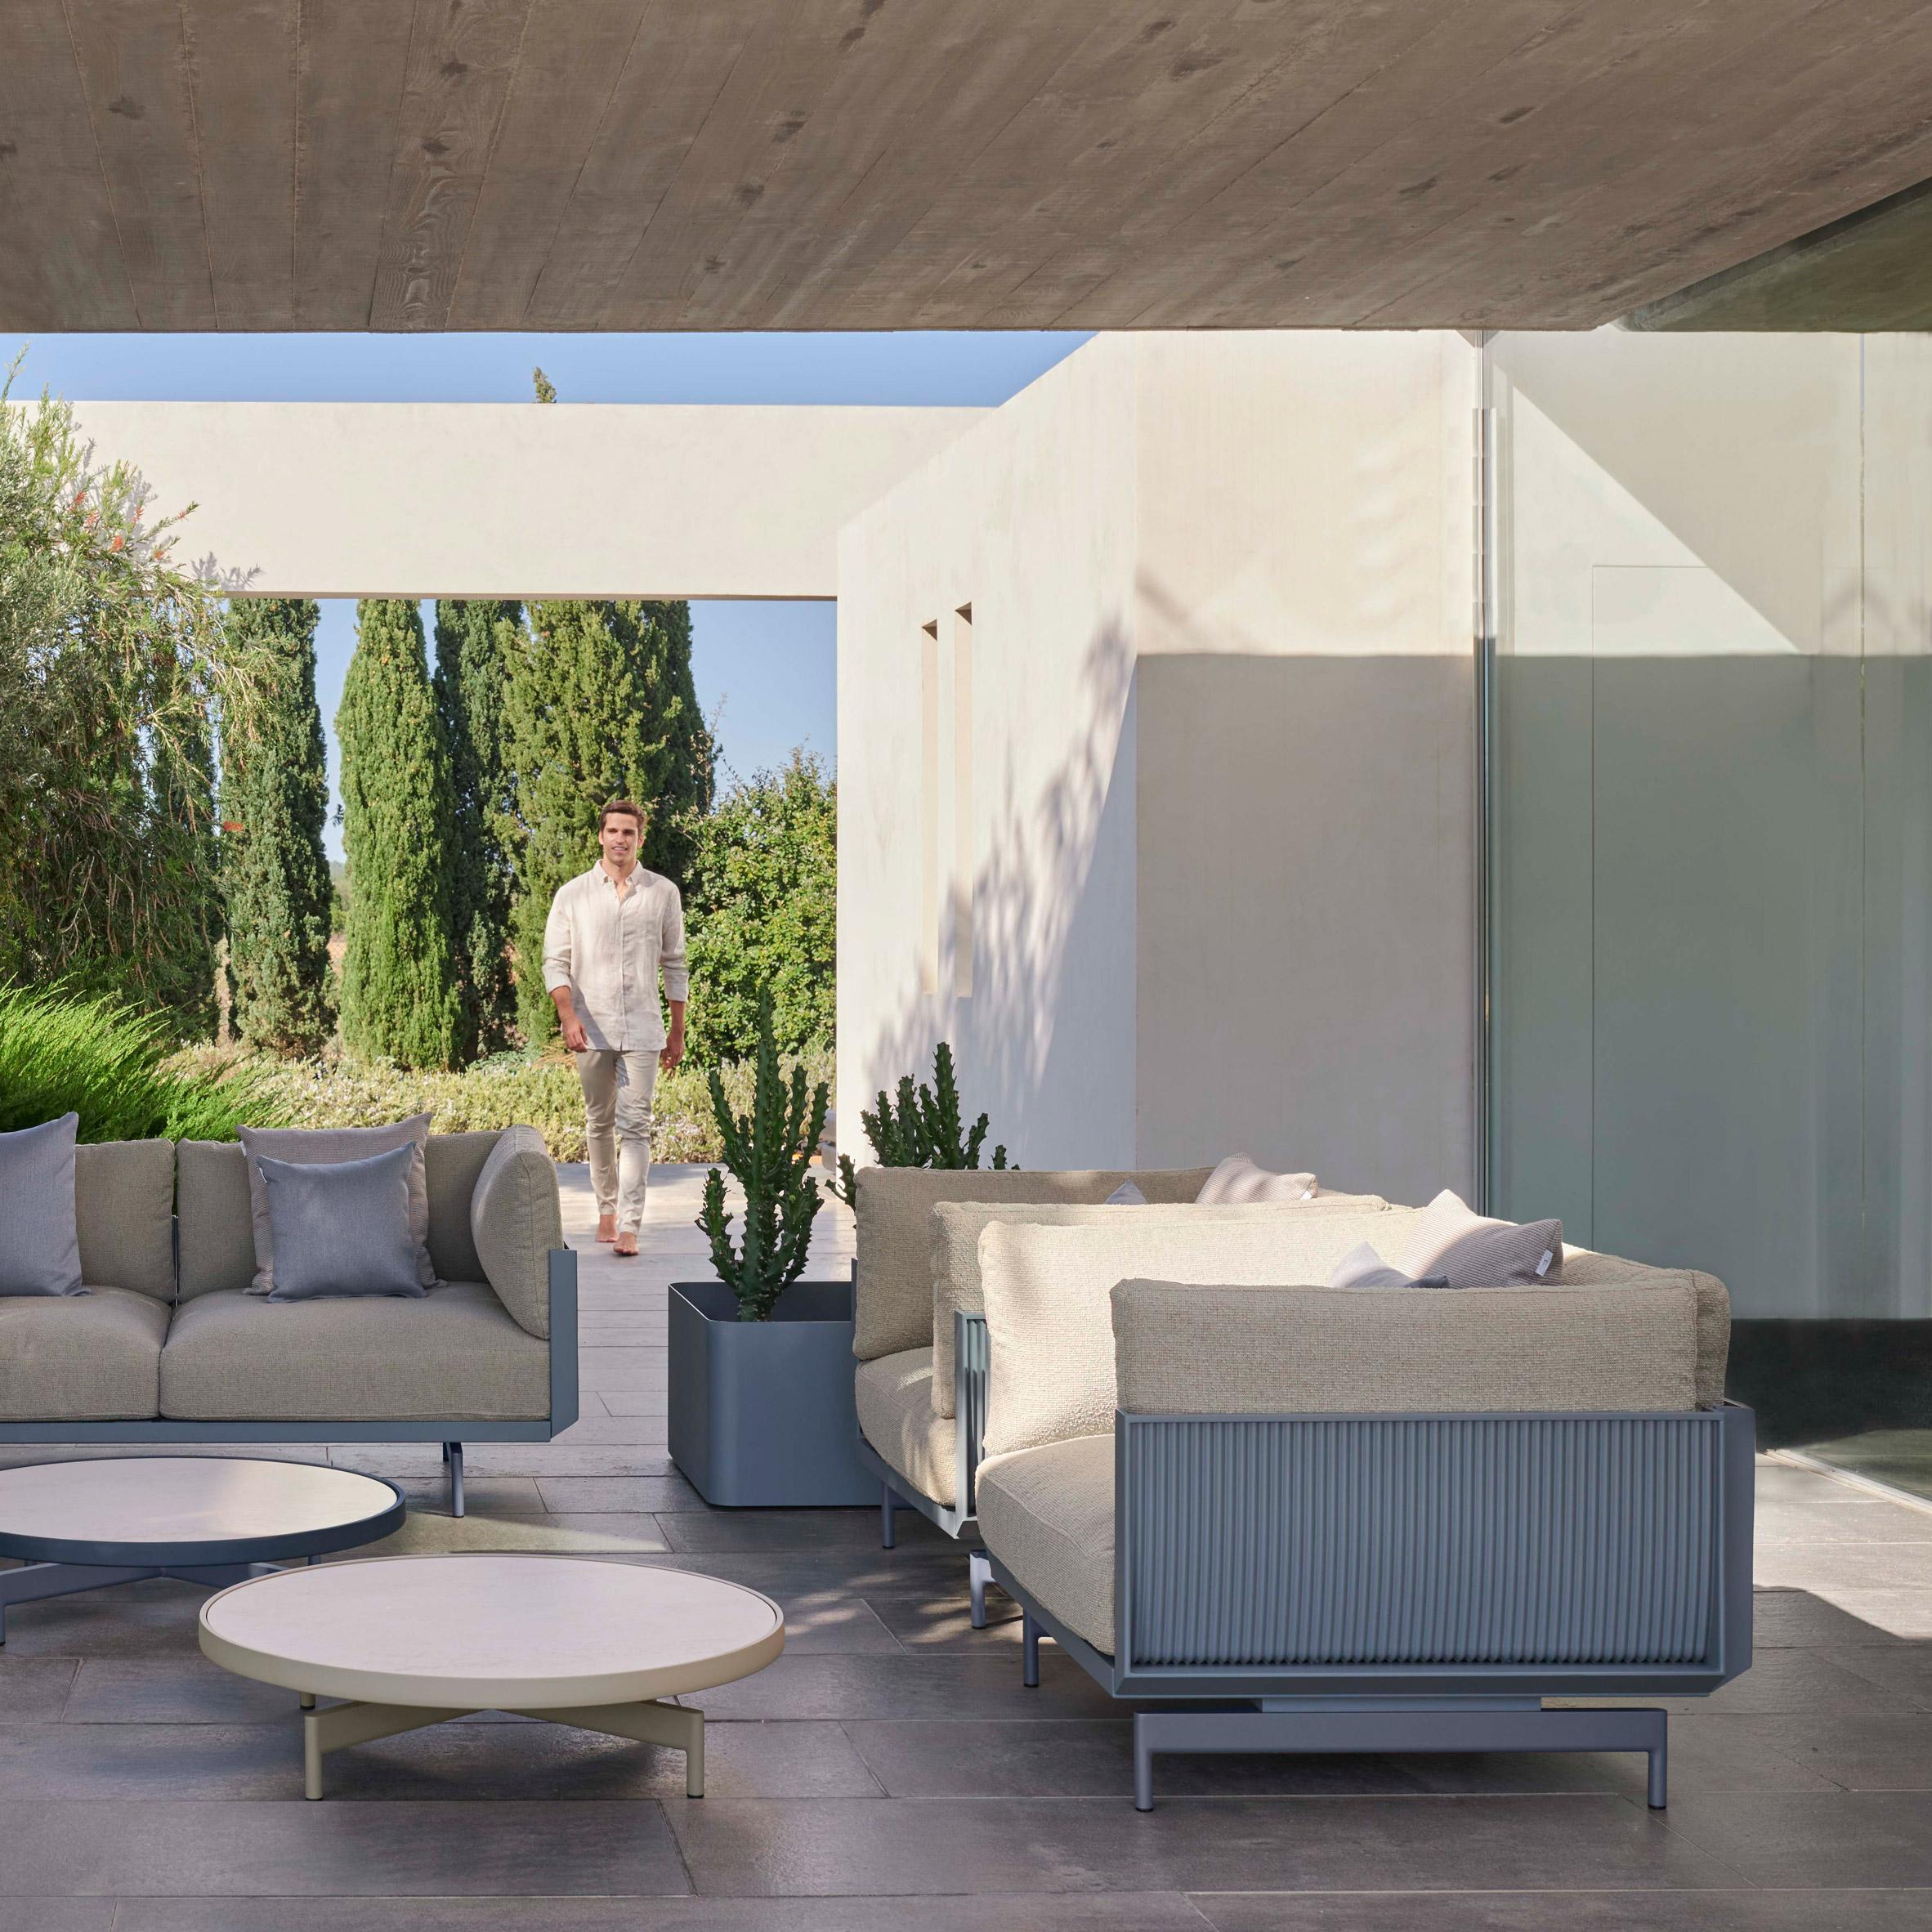 Onde outdoor seating by Luca Nichetto for Gandia Blasco